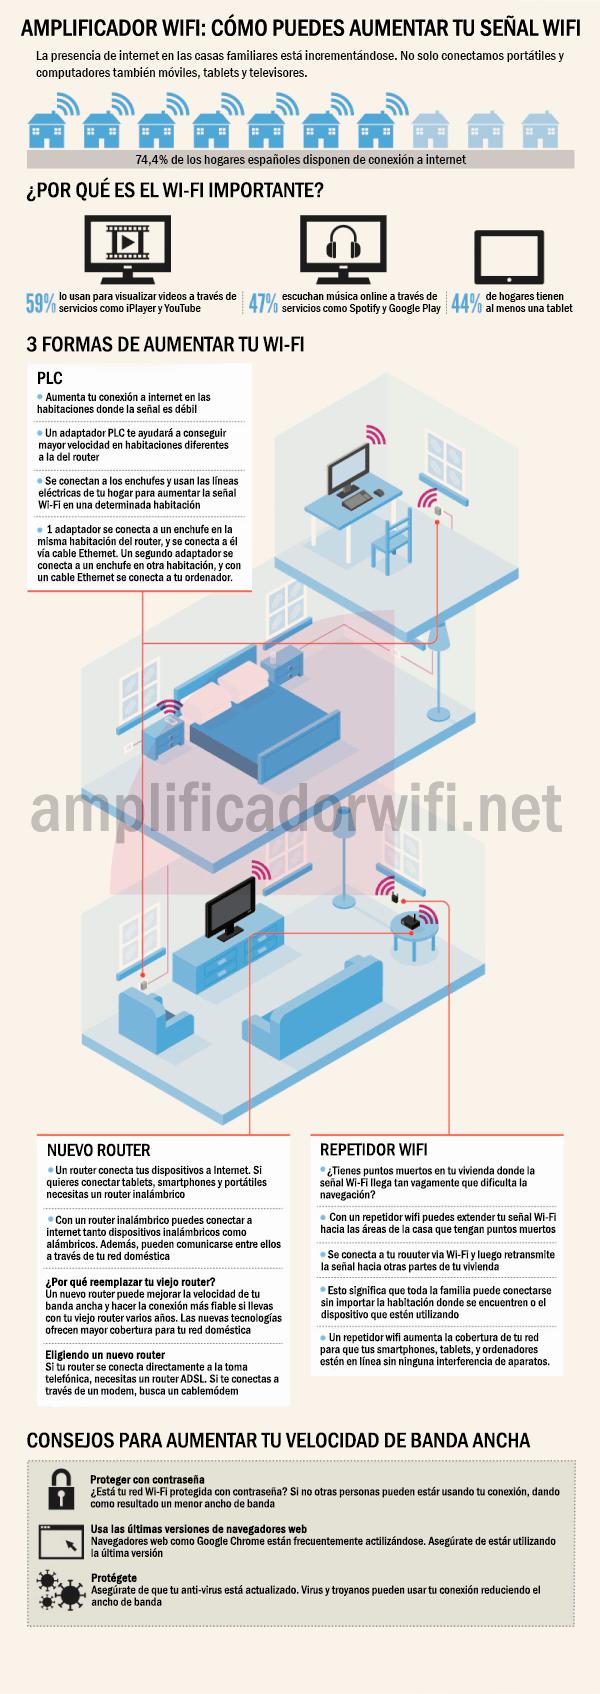 Cómo aumentar tu señal WiFi